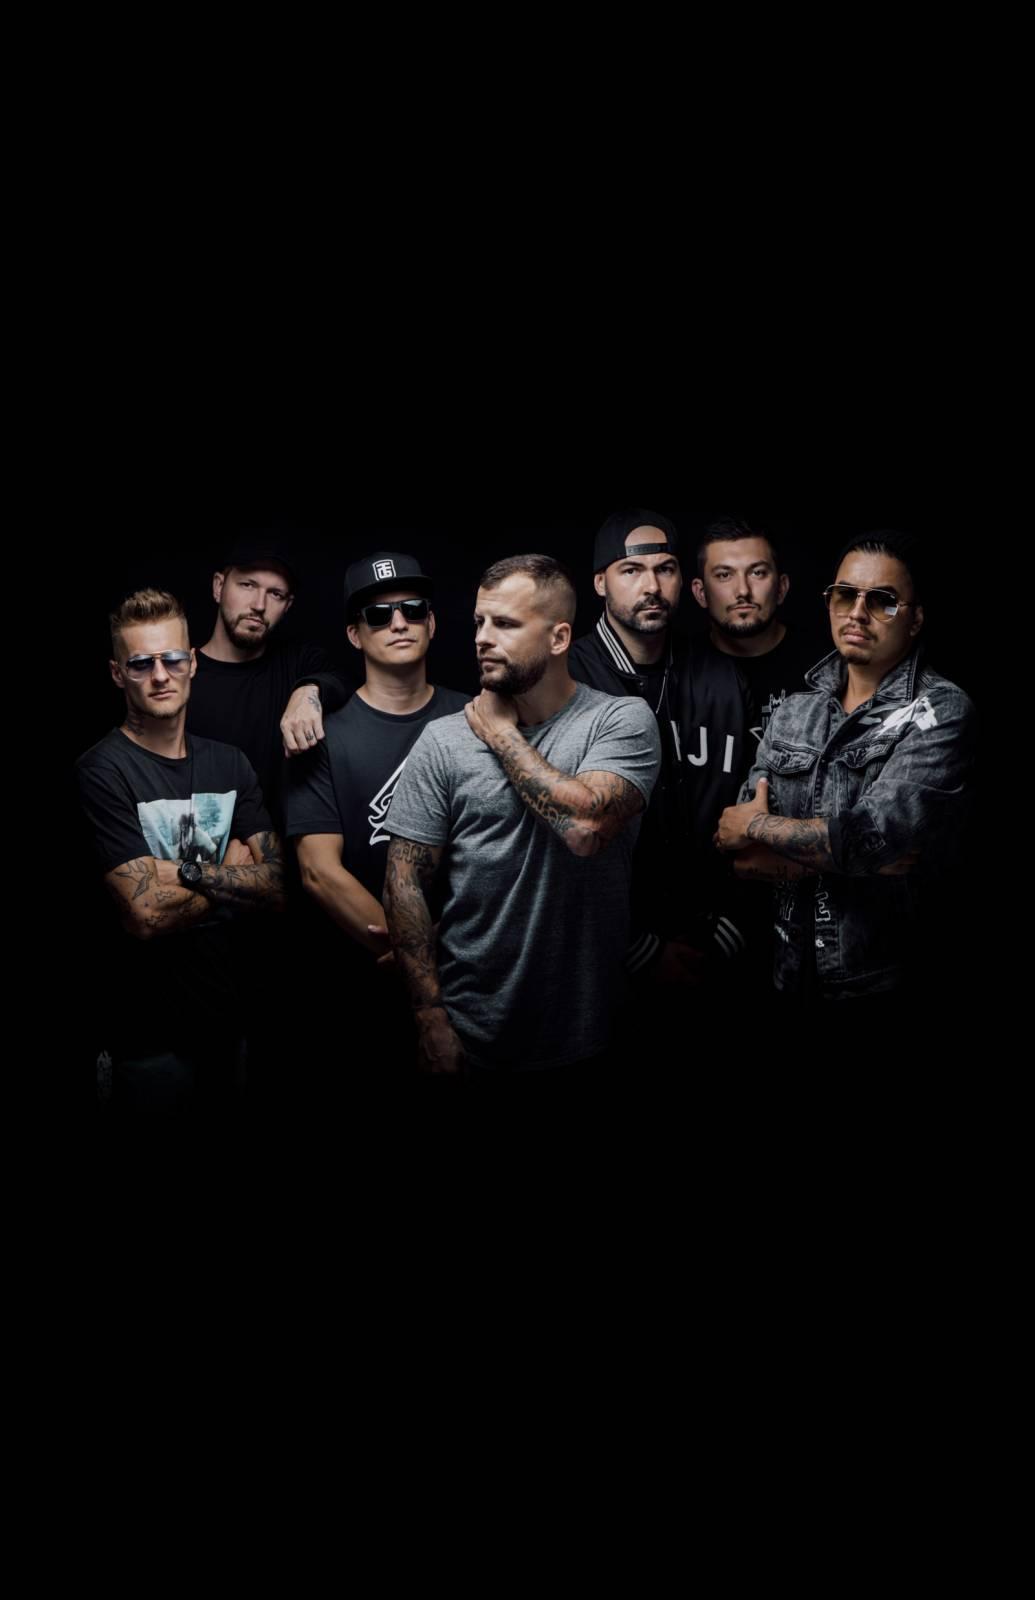 RECENZE: Marpo & TroubleGang vydali album za hranicemi hip hopu. Je jejich terapií